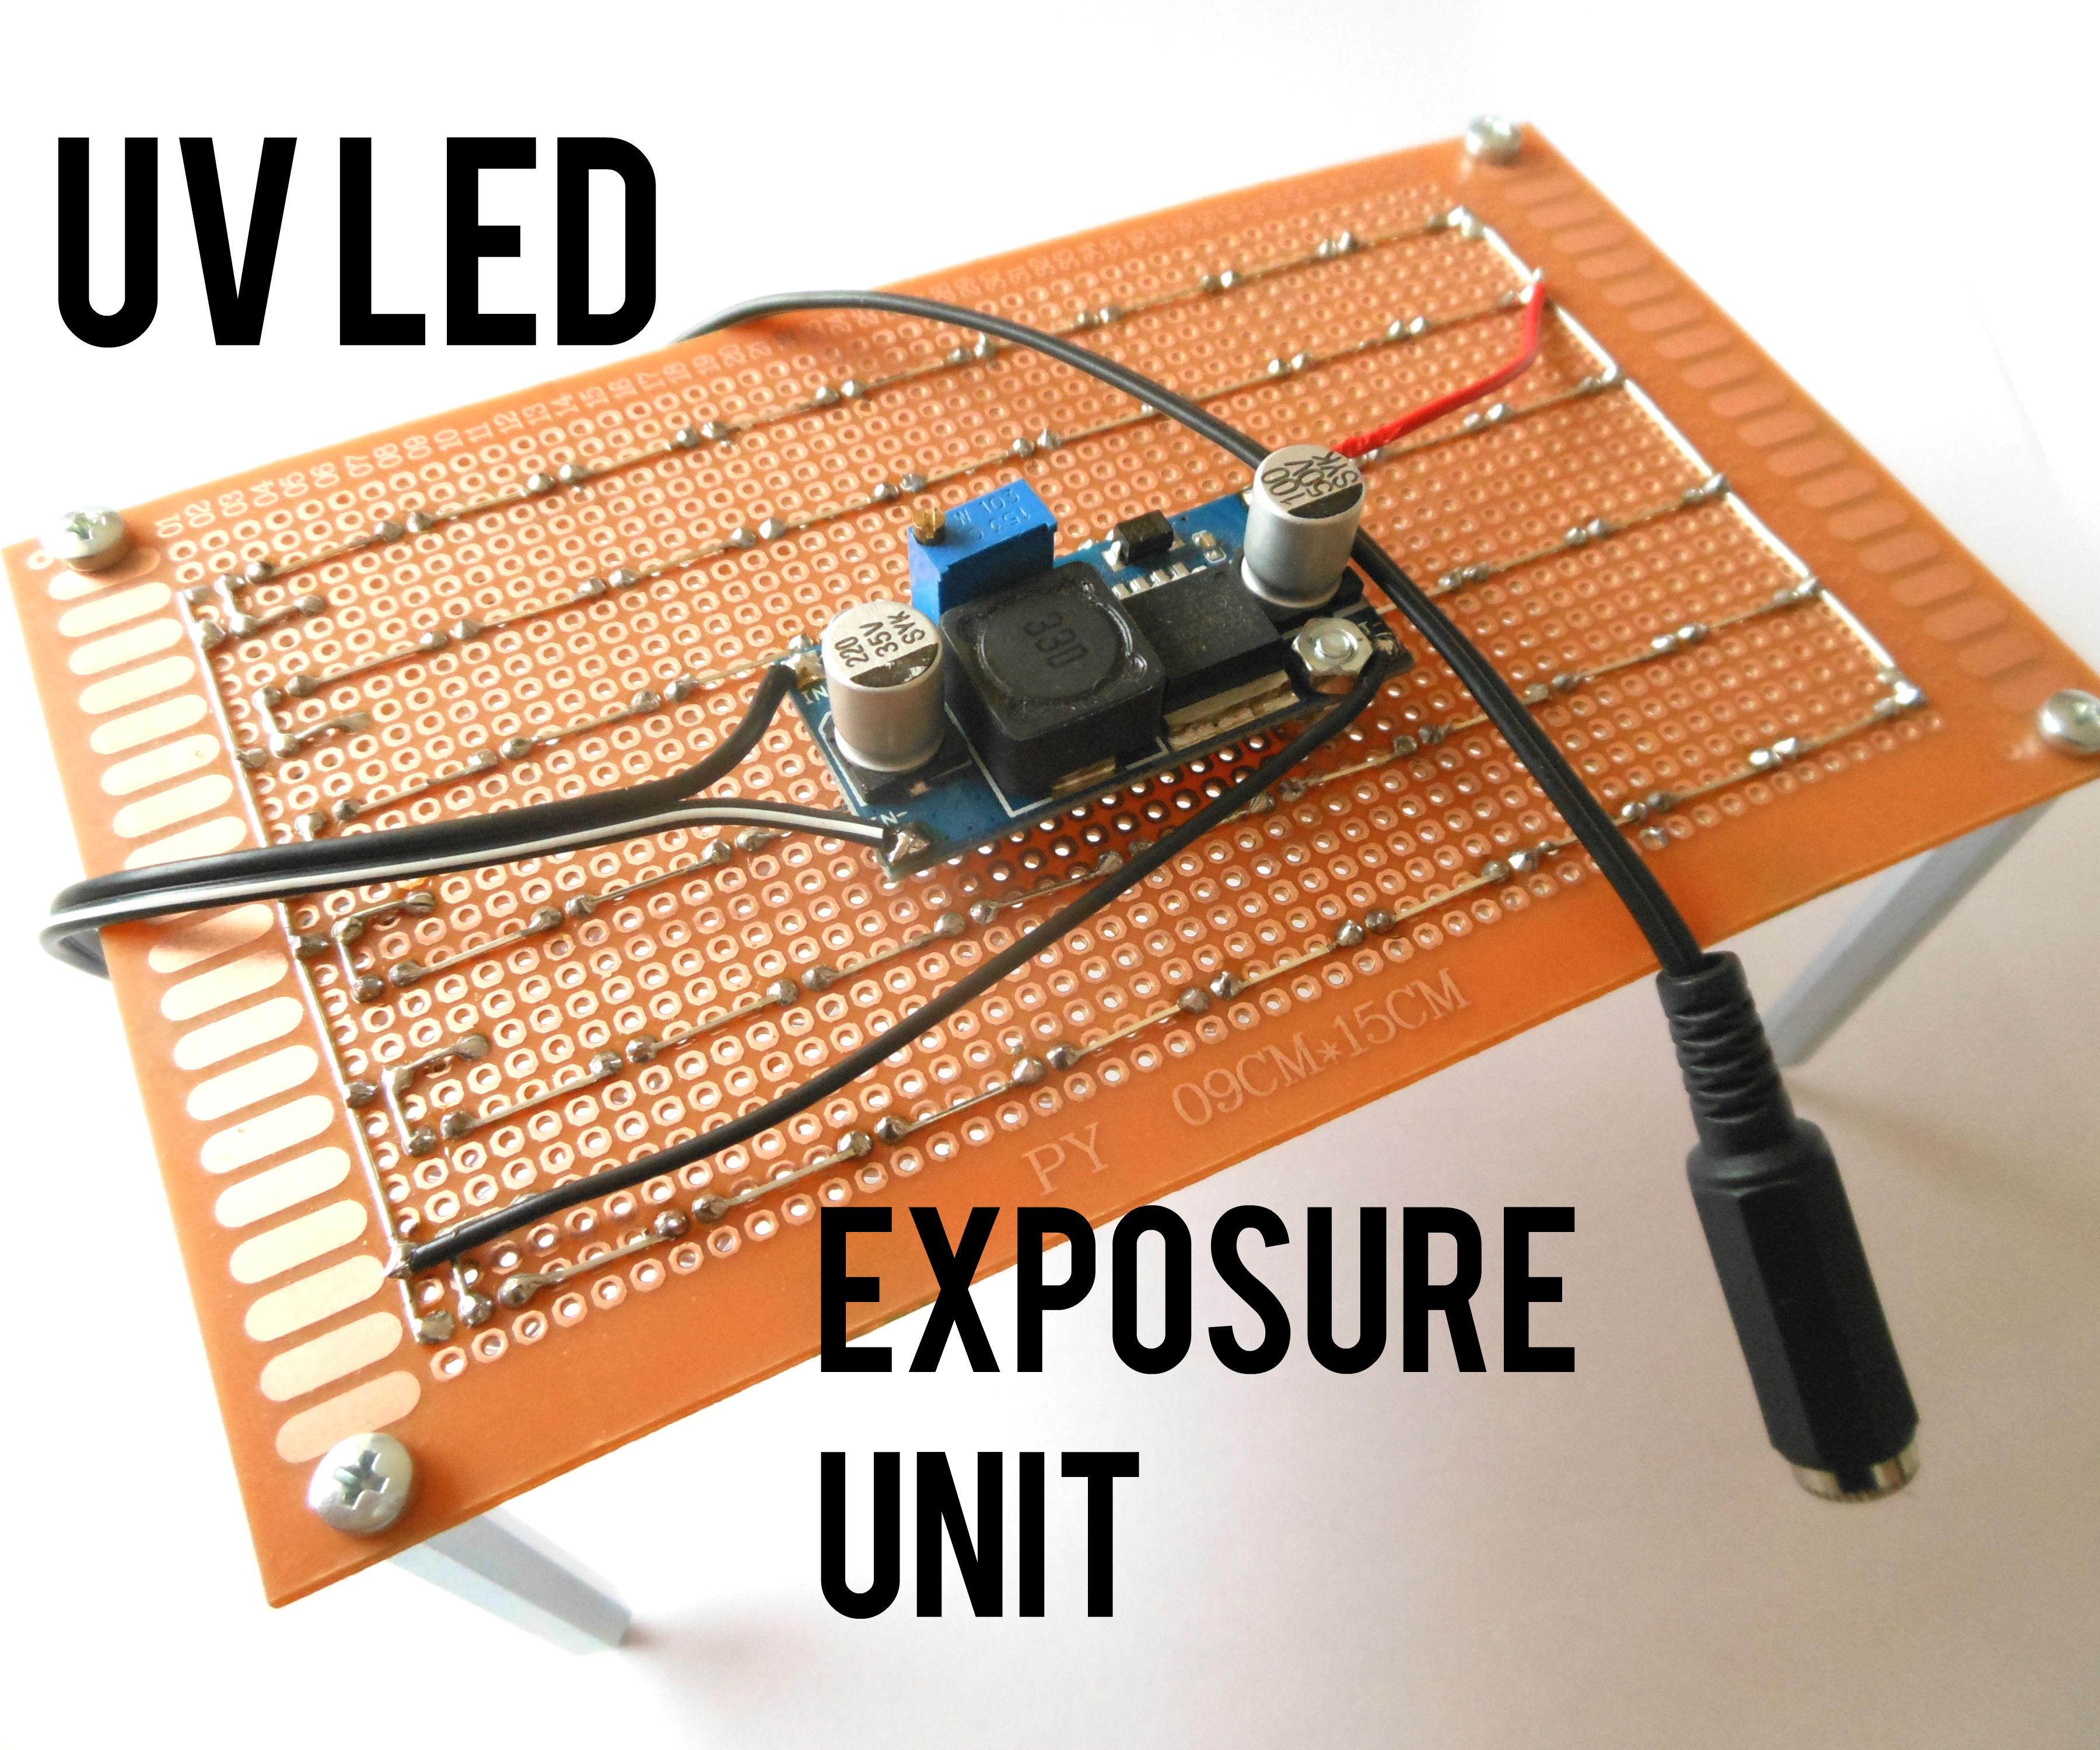 Modular UV LED Exposure Unit